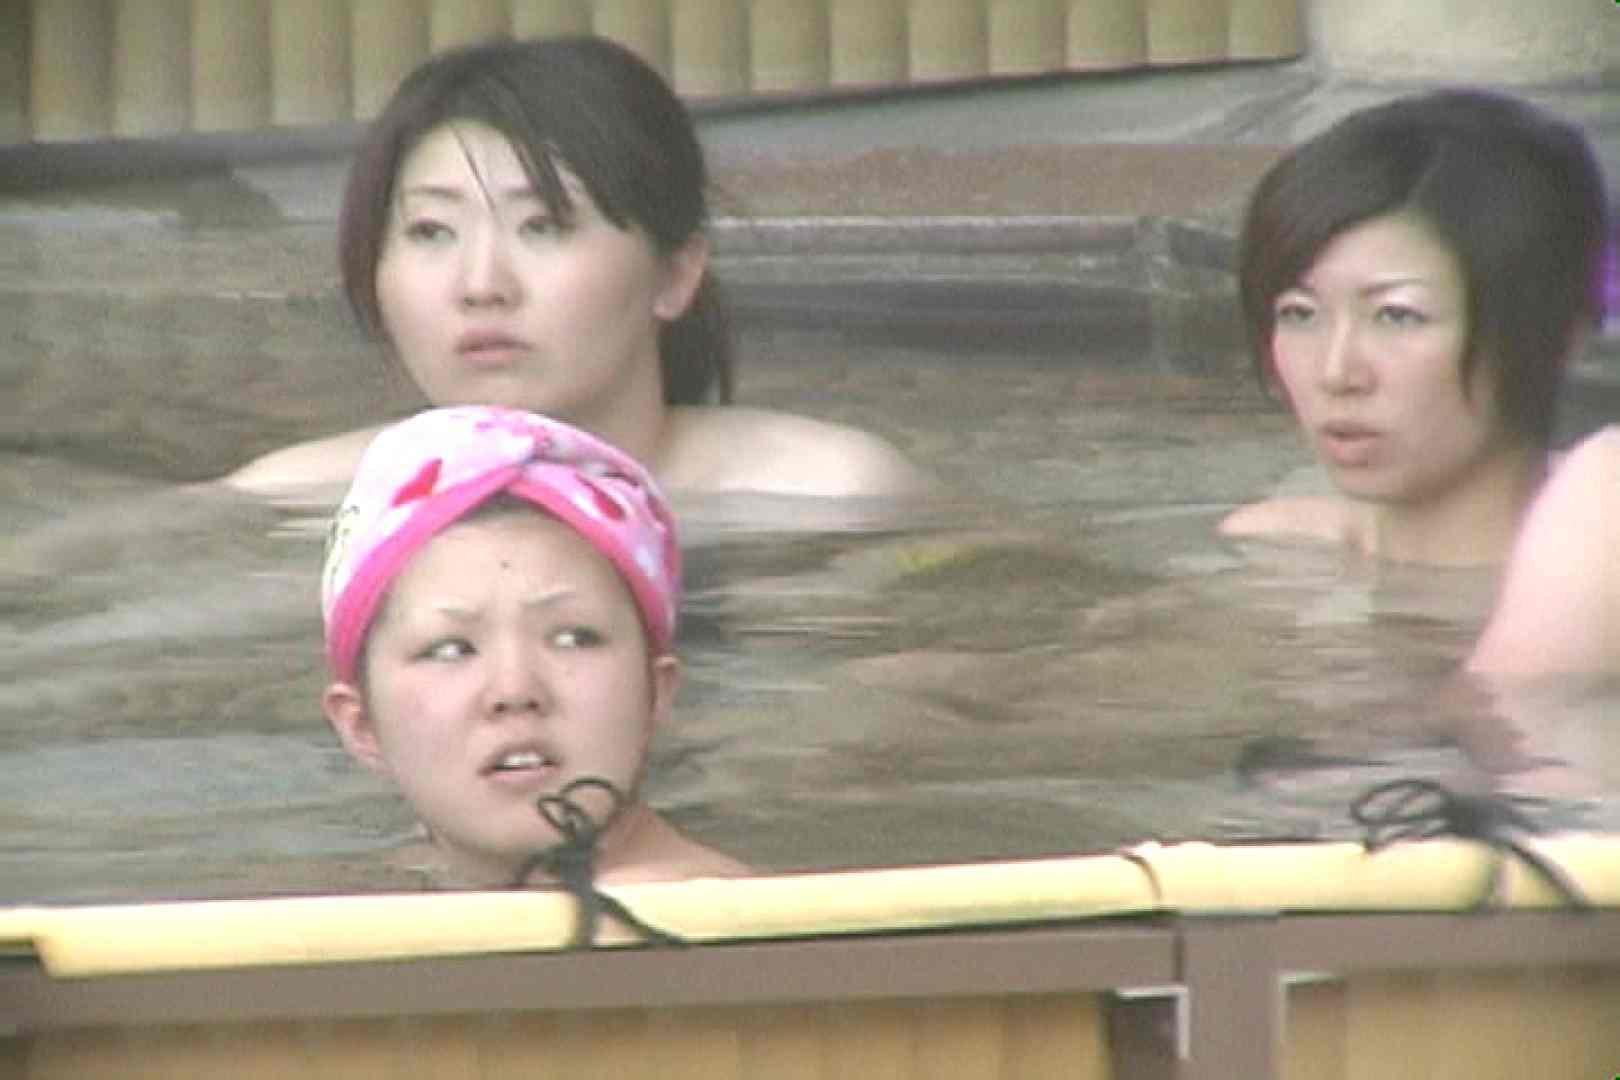 Aquaな露天風呂Vol.25 露天風呂編 | 盗撮シリーズ  91PIX 35